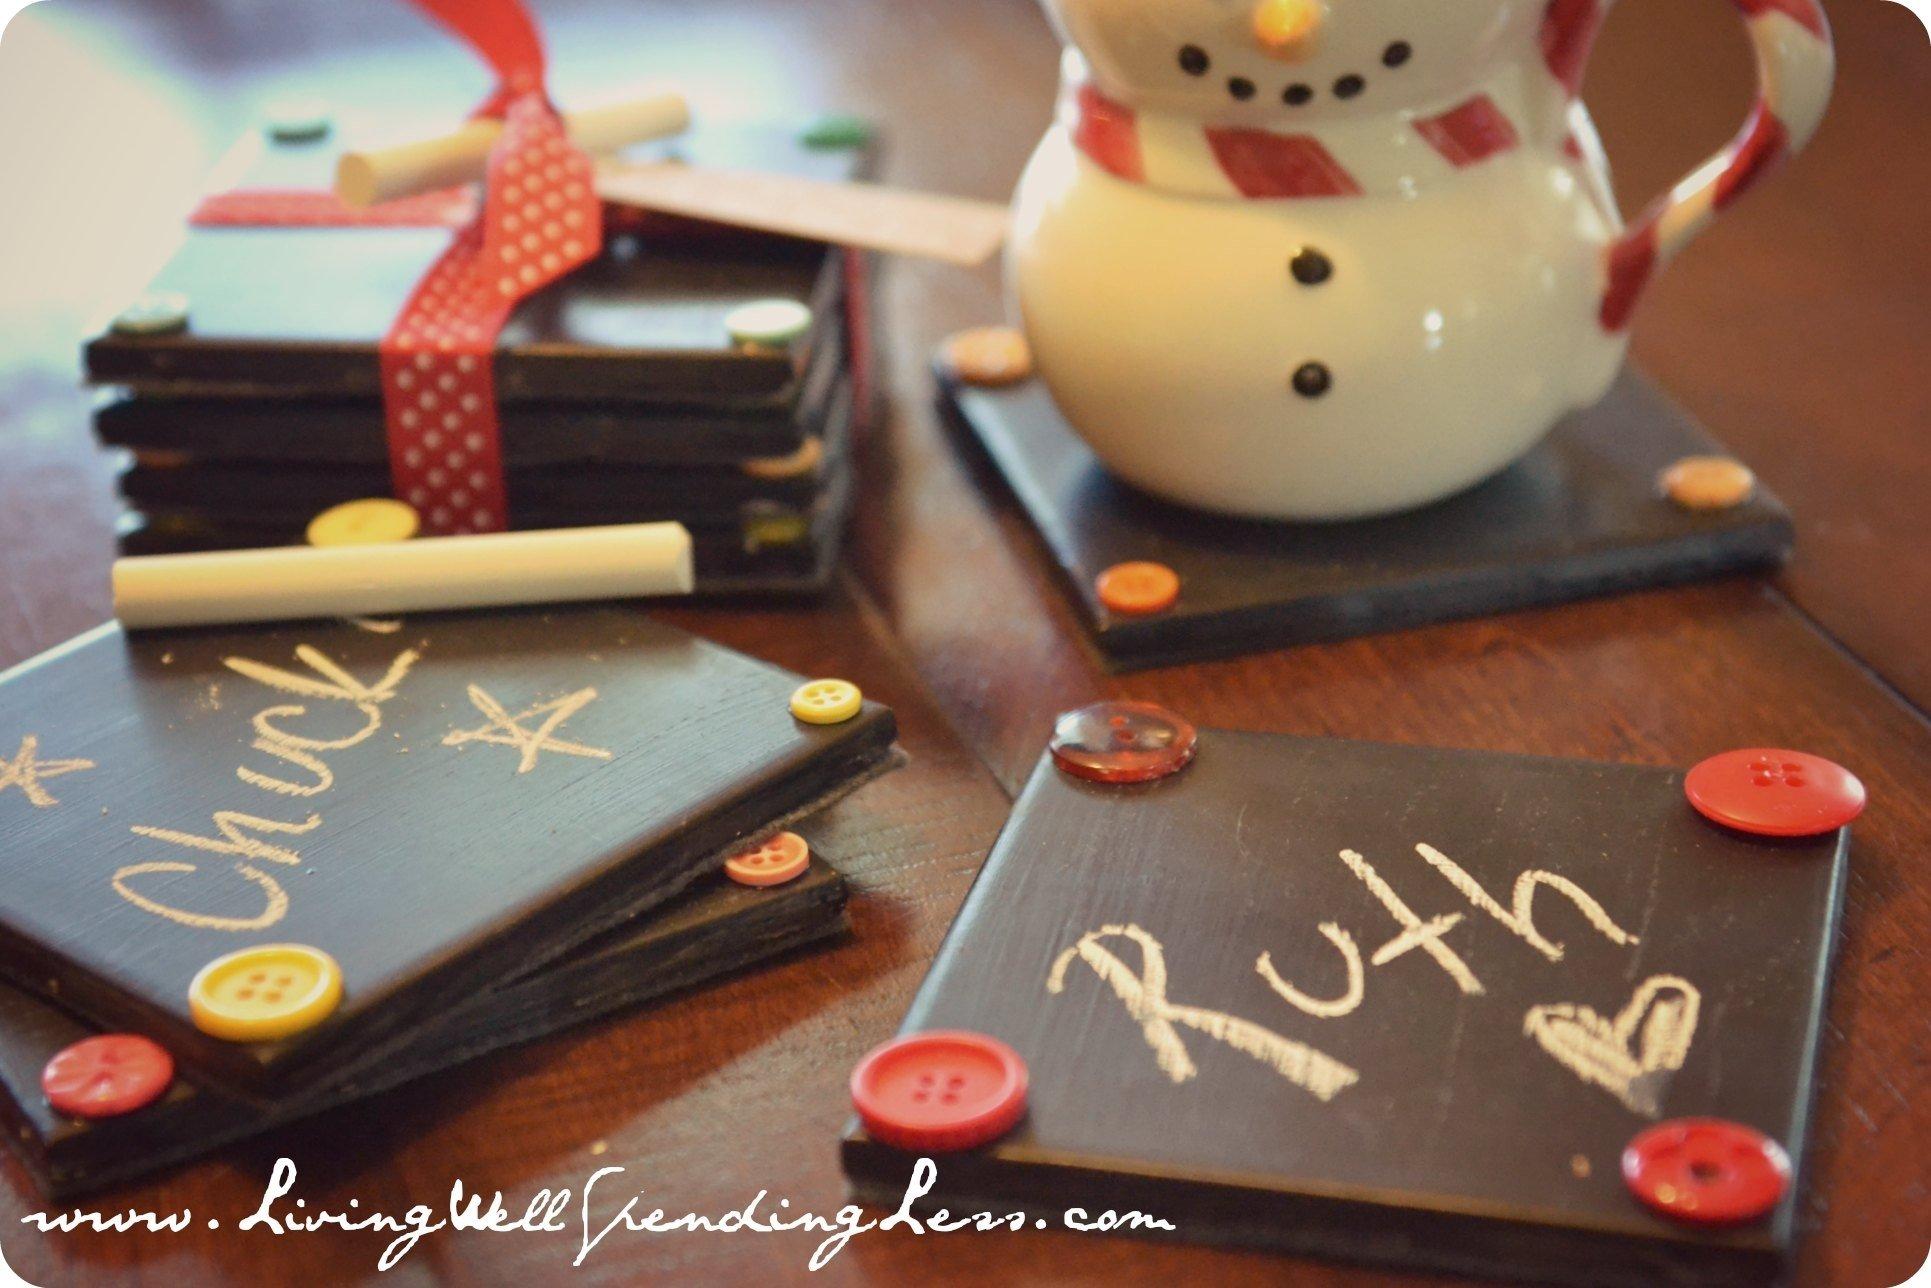 10 Fashionable Cute Christmas Gift Ideas For Friends christmas gift ideas for friends with others diy chalkboard coaster 2021